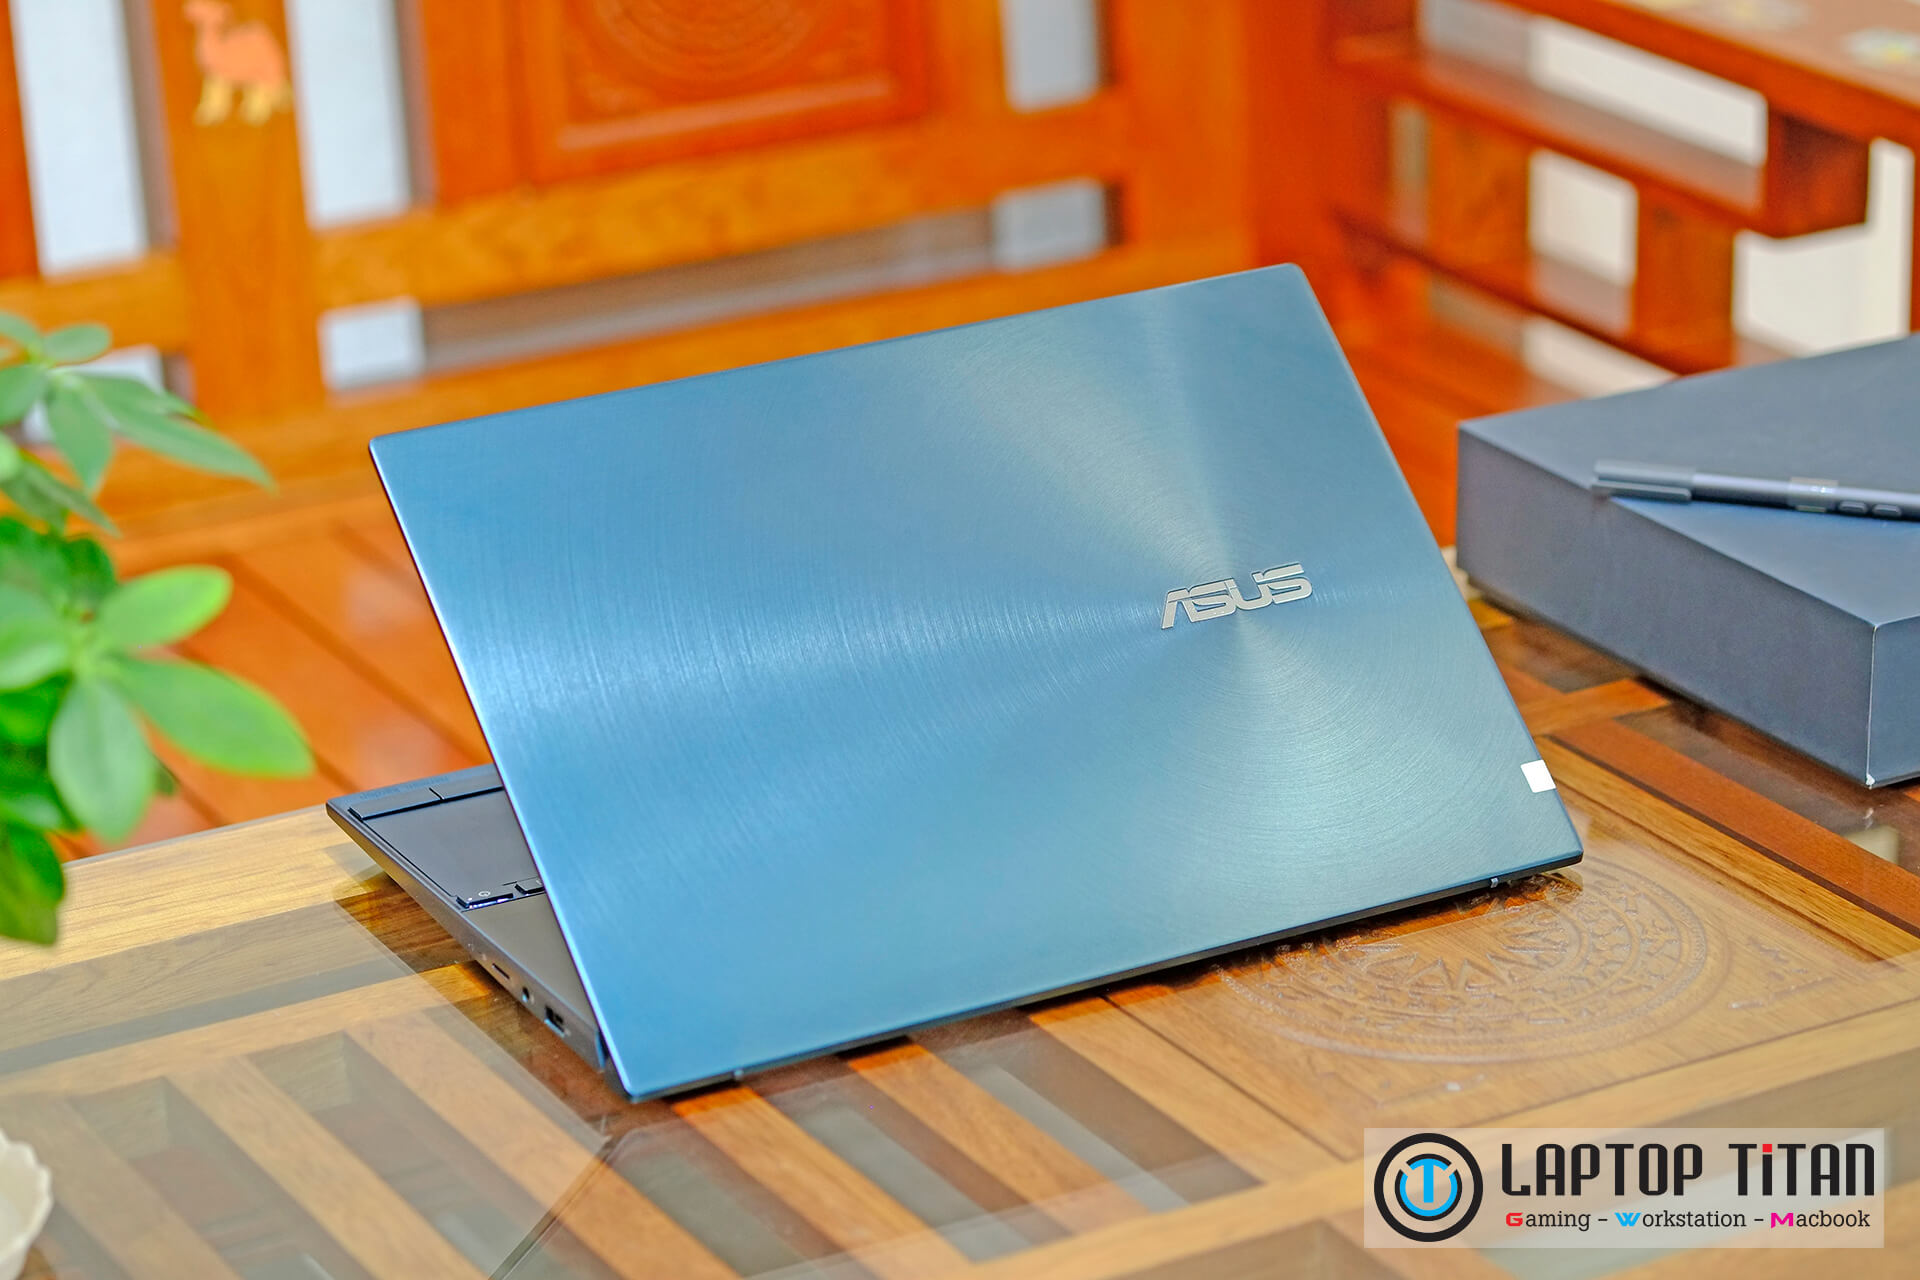 Asus-Zenbook-Duo-UX481FL-laptoptitan-07